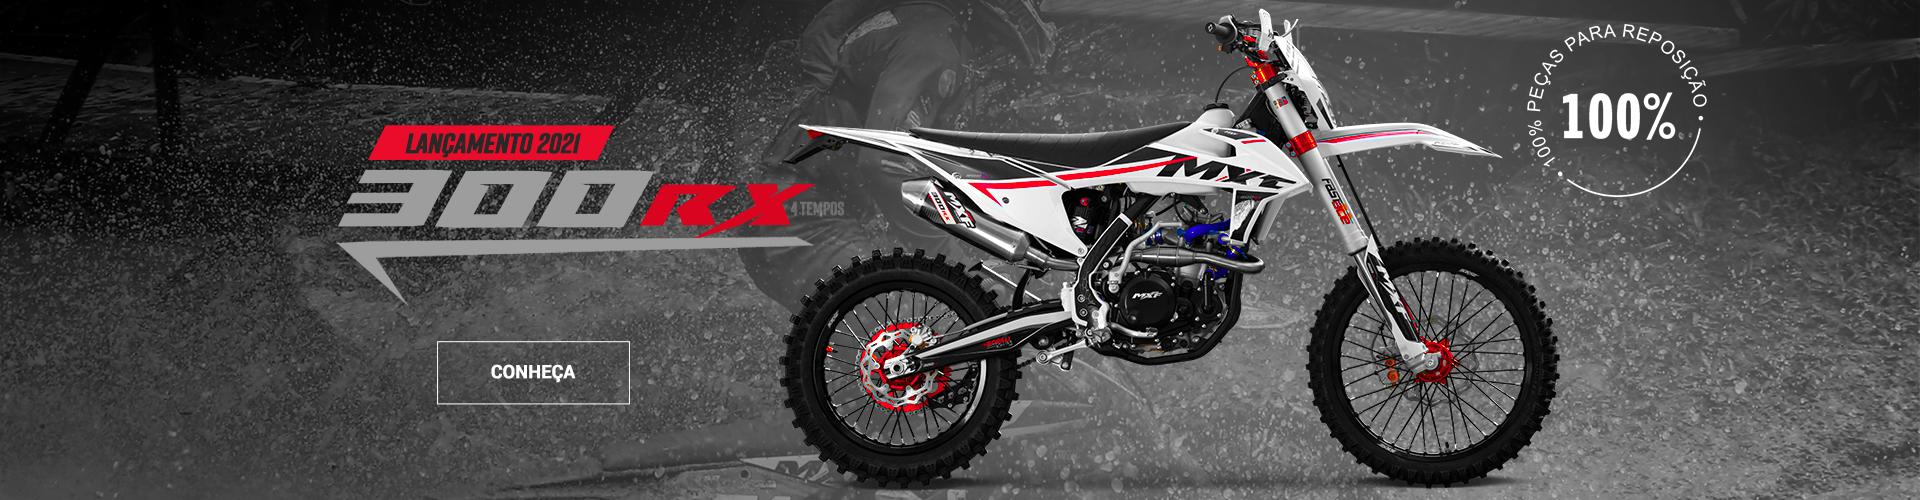 moto 300rx